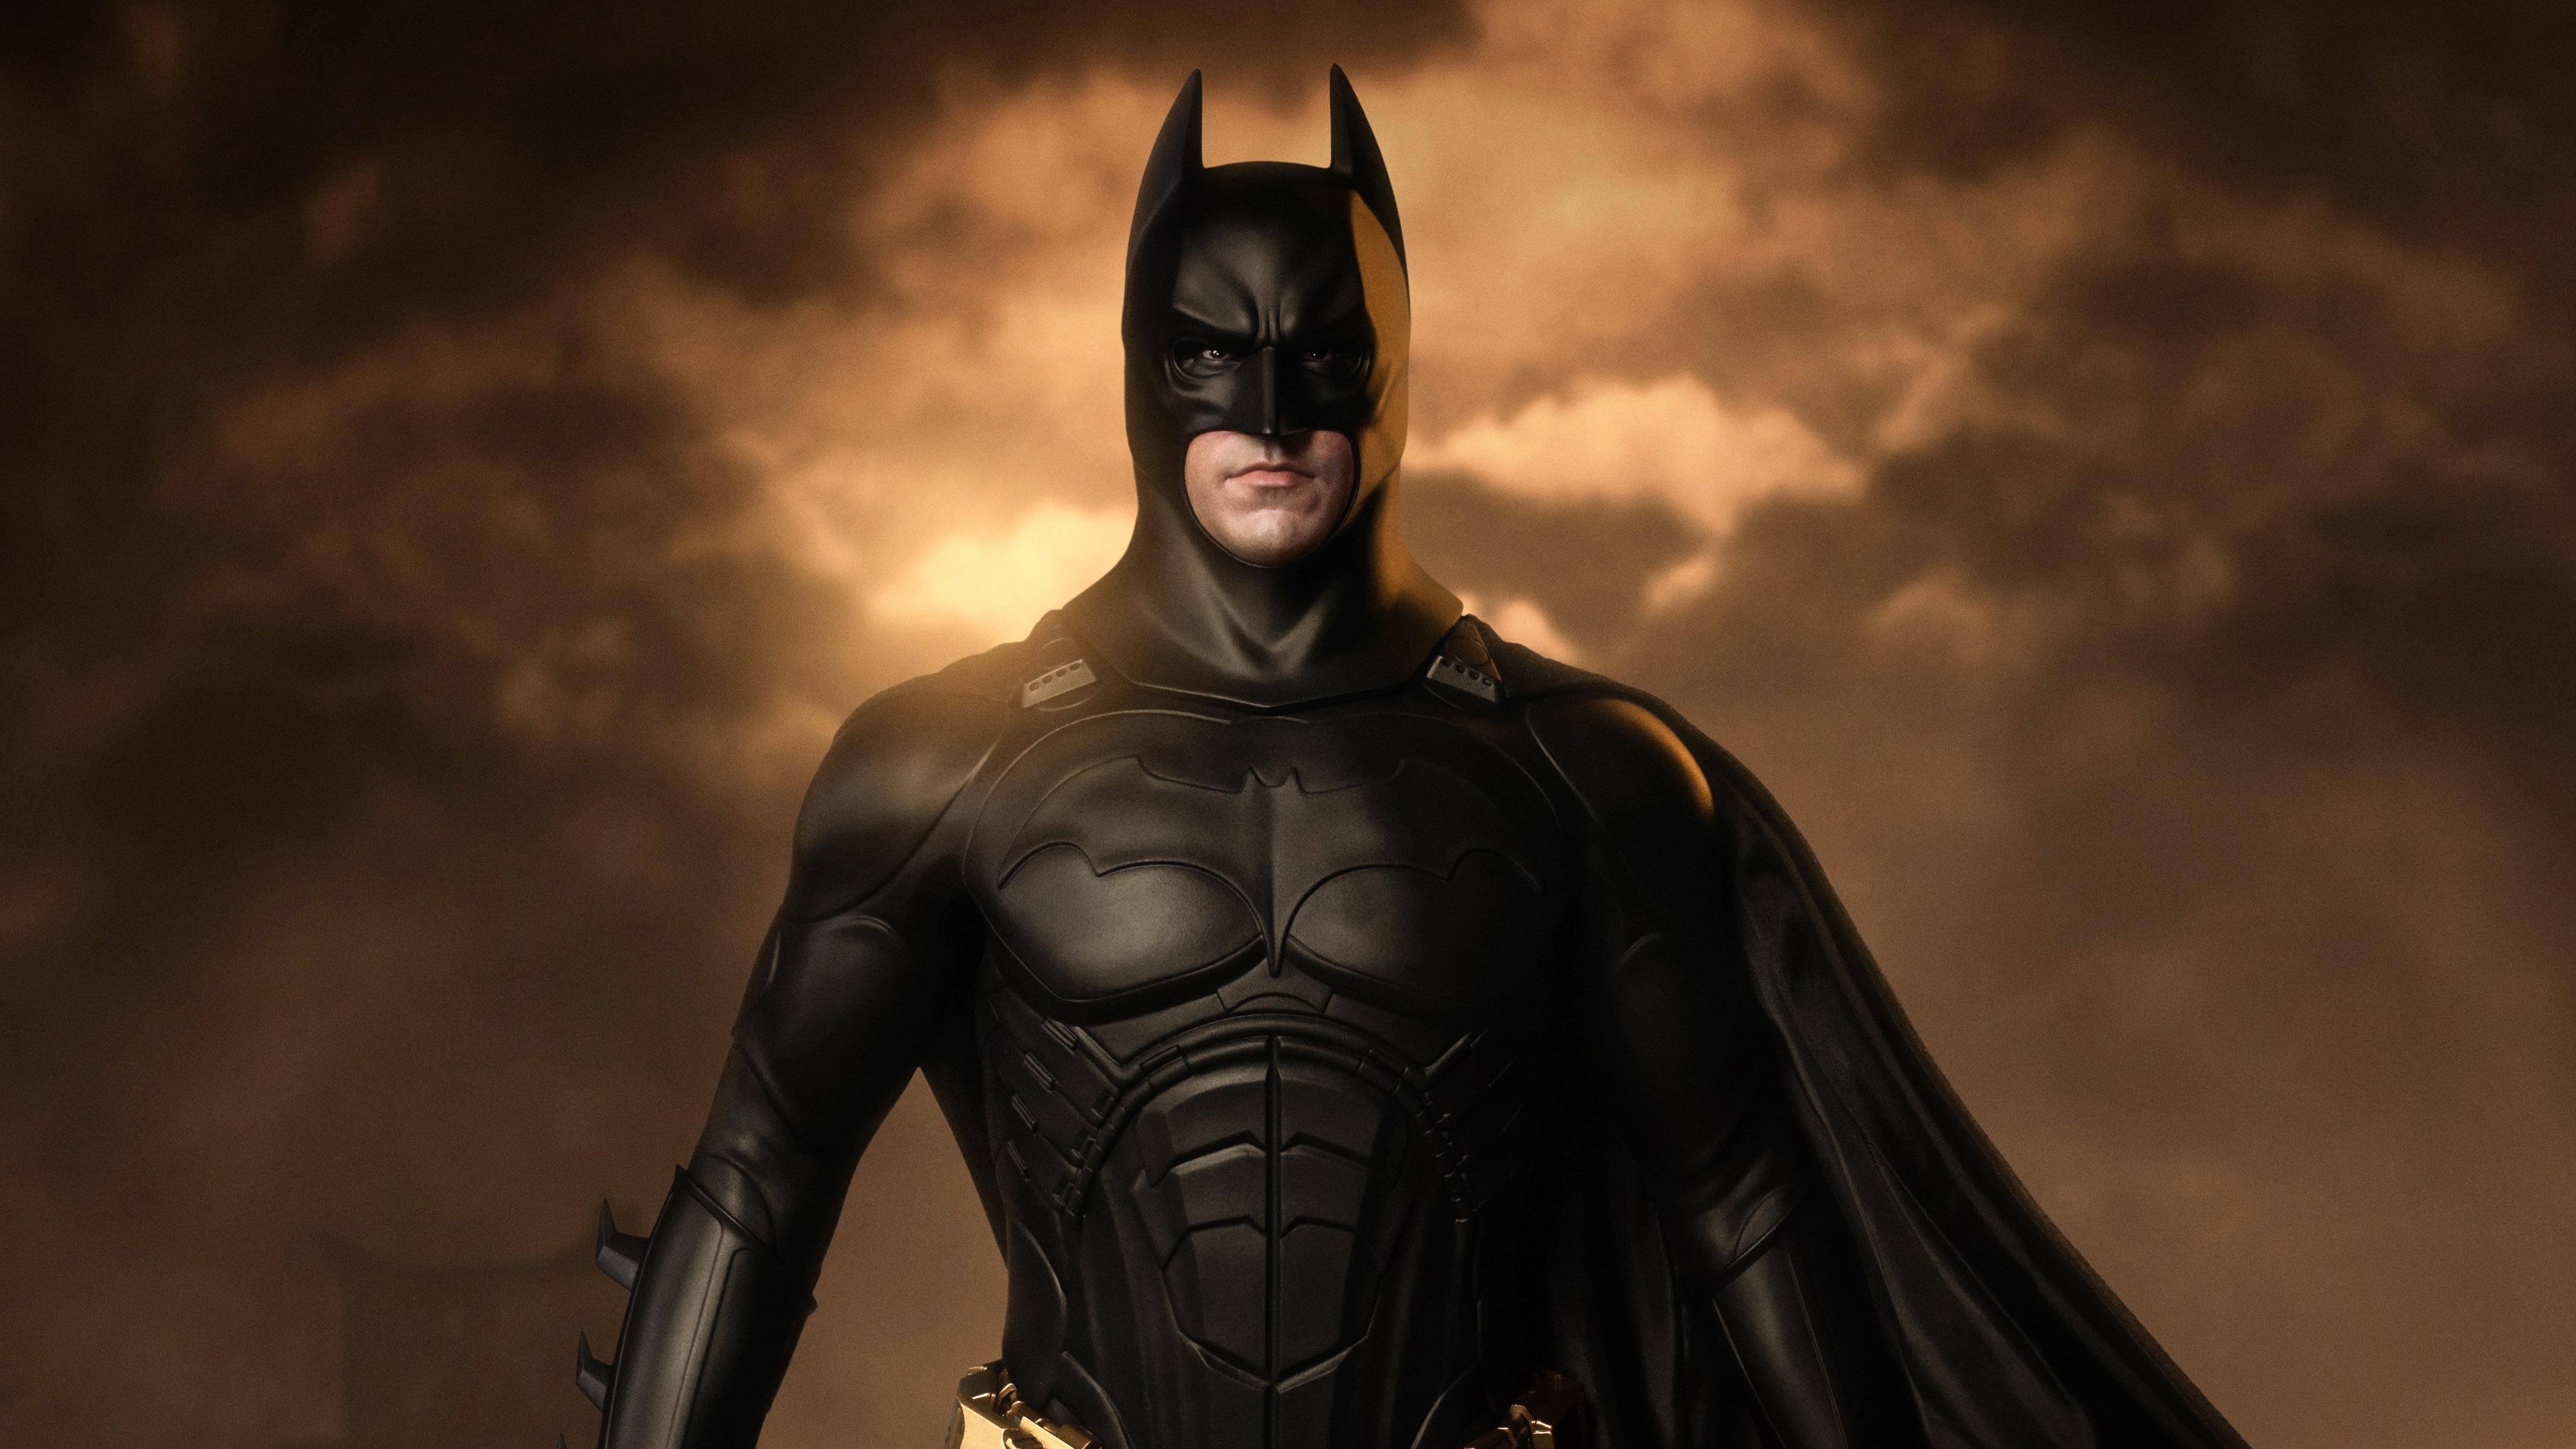 Awesome Batman Begins Logo Wallpaper Hd Batman Begins Desenhos